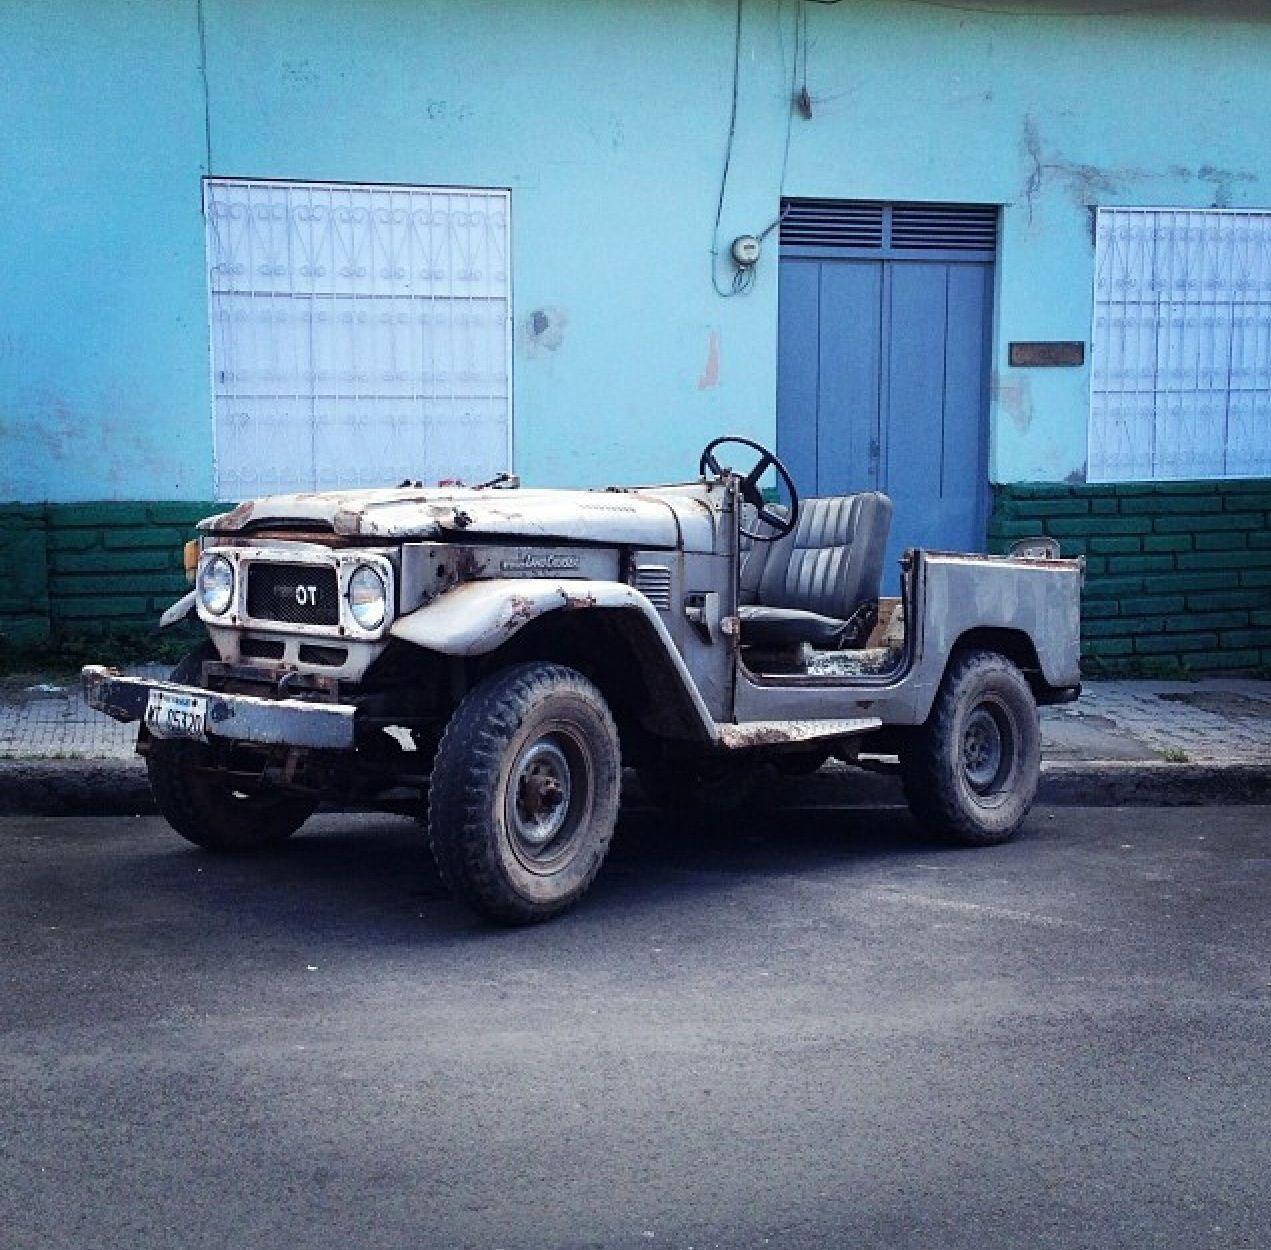 Matagalpa Nicaragua Land Cruiser Surviving A Rough Life